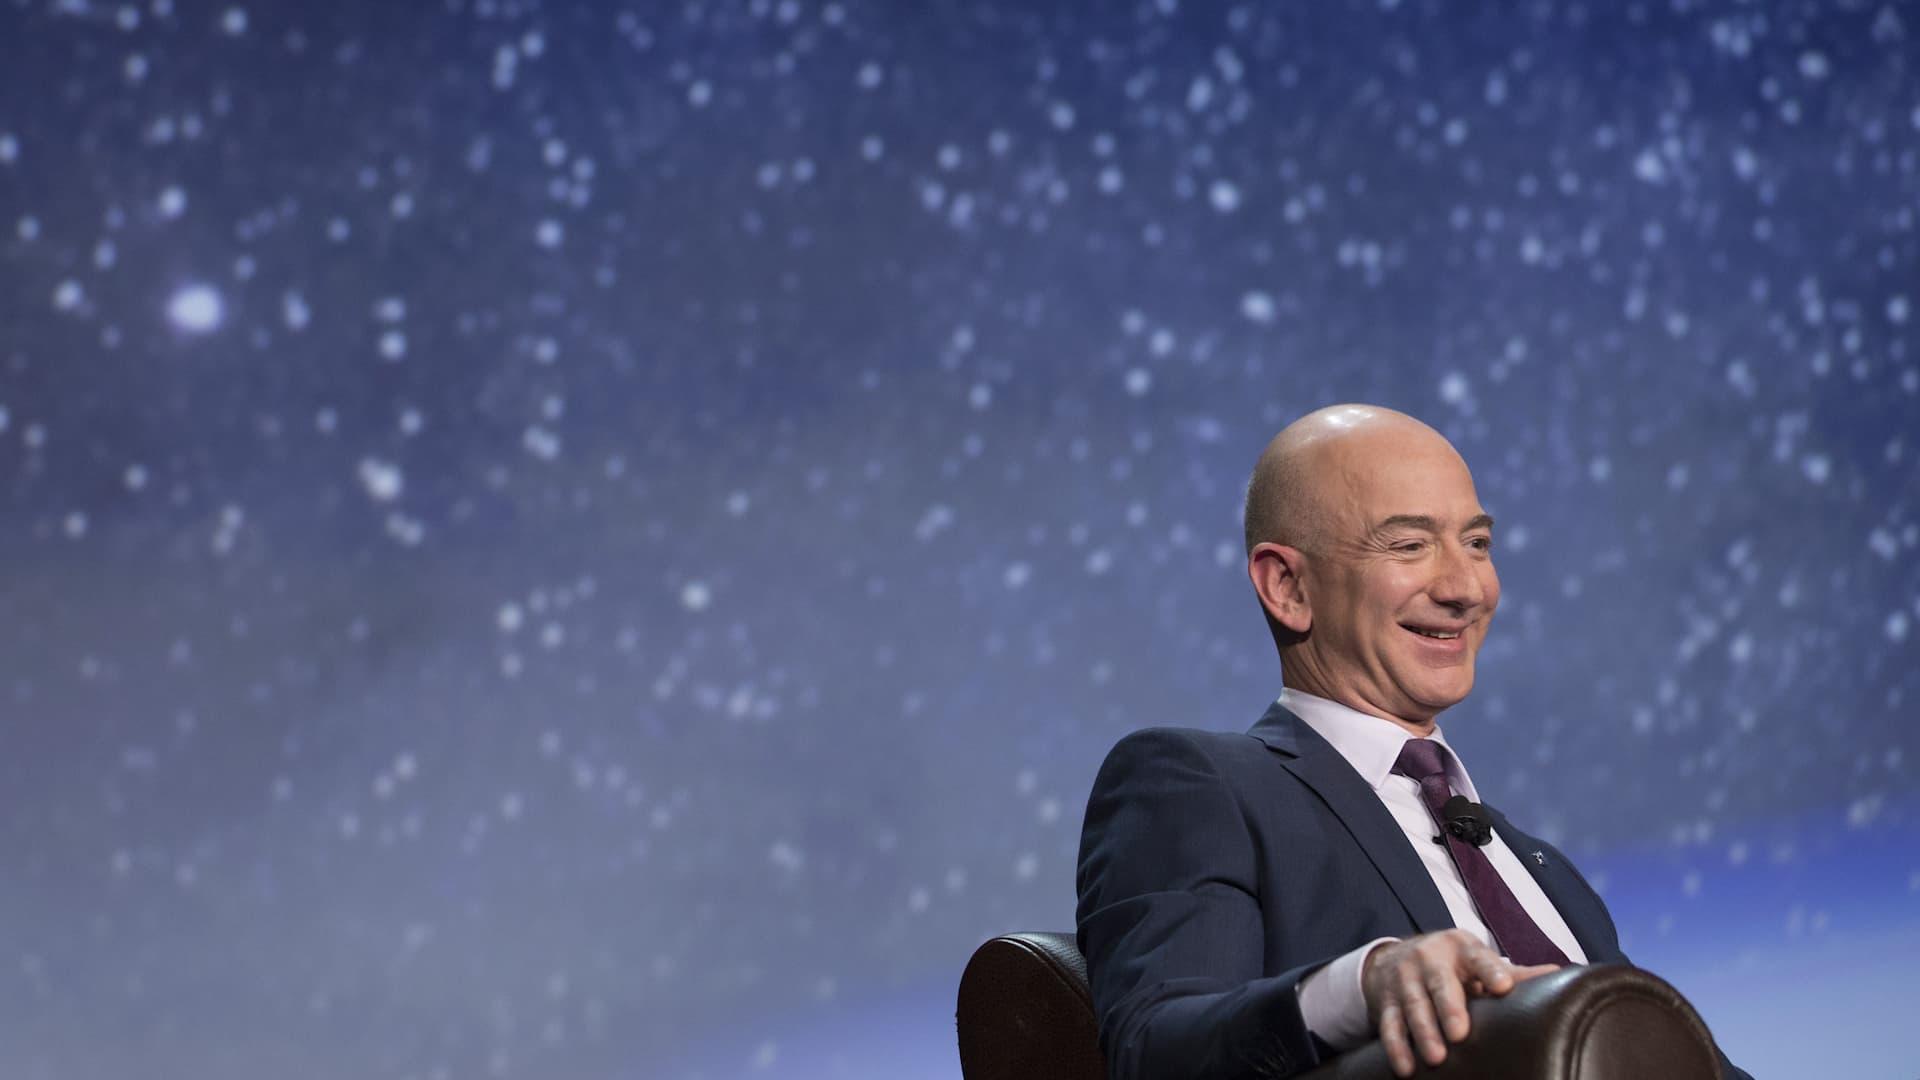 The Jeff Bezos Quote That Nasdaq Ceo Adena Friedman Lives By